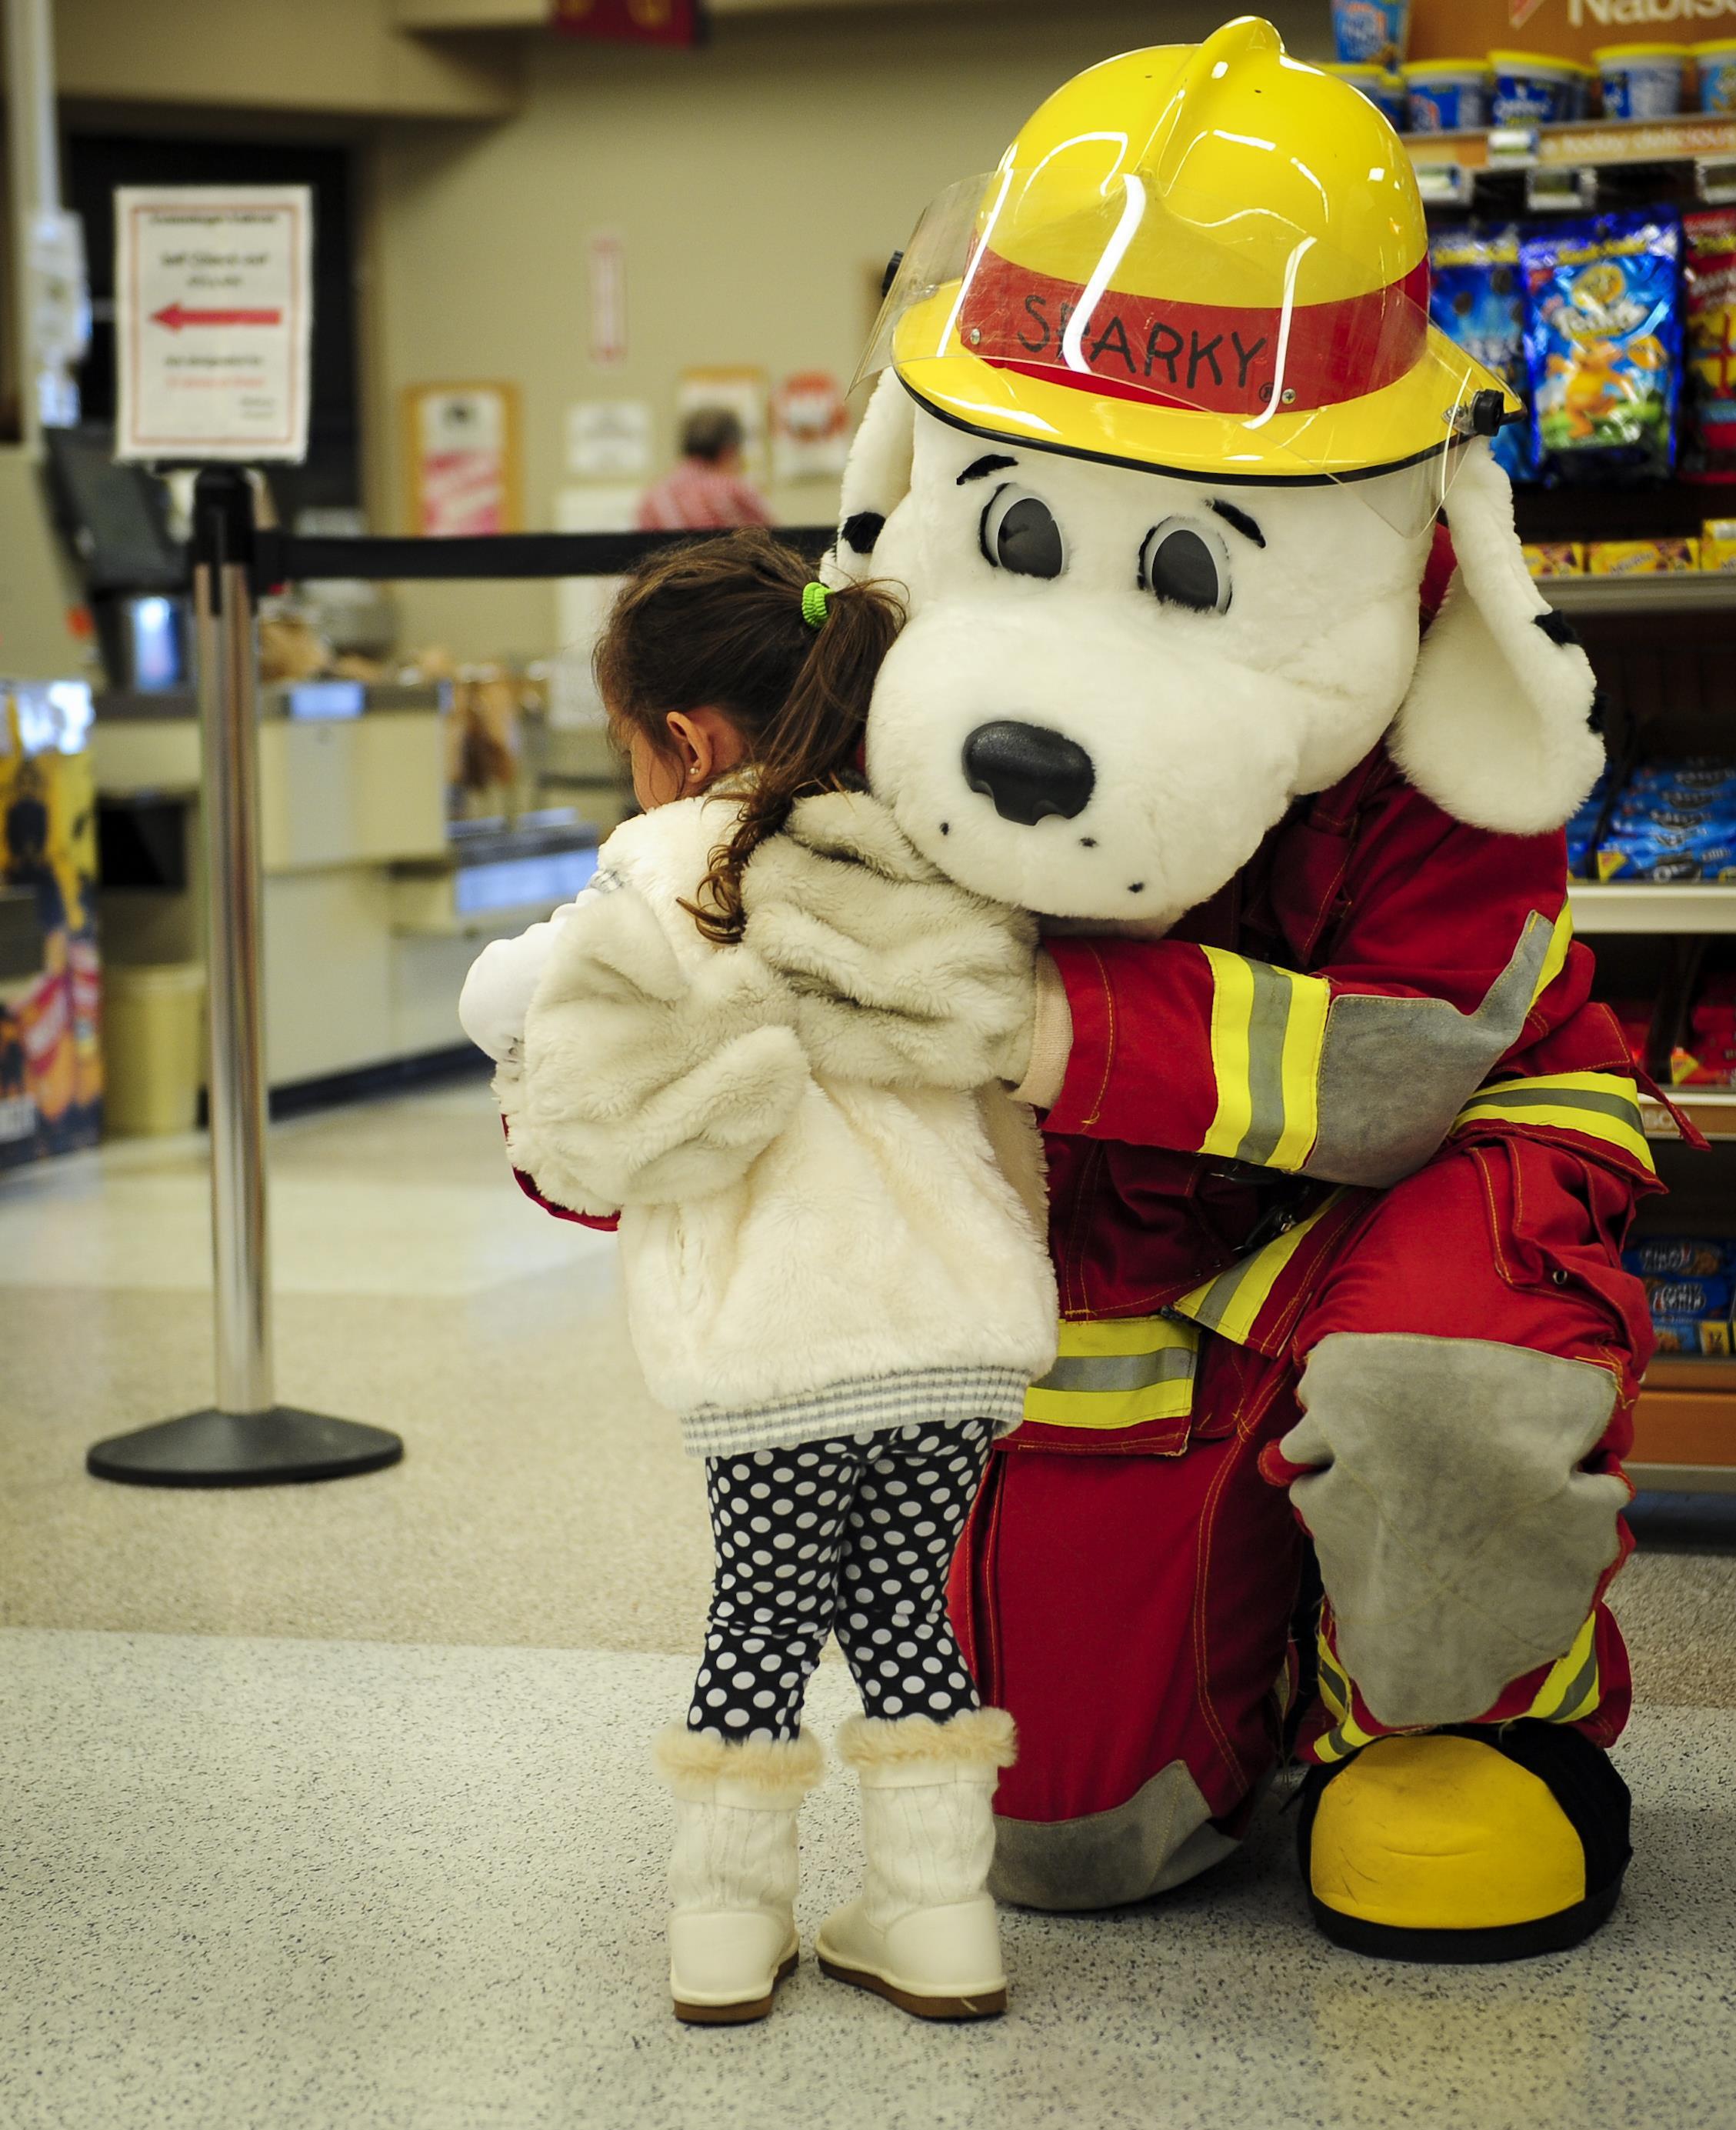 Sparky The Fire Dog National Prevention Association Spokesdog Hugs A Girl During